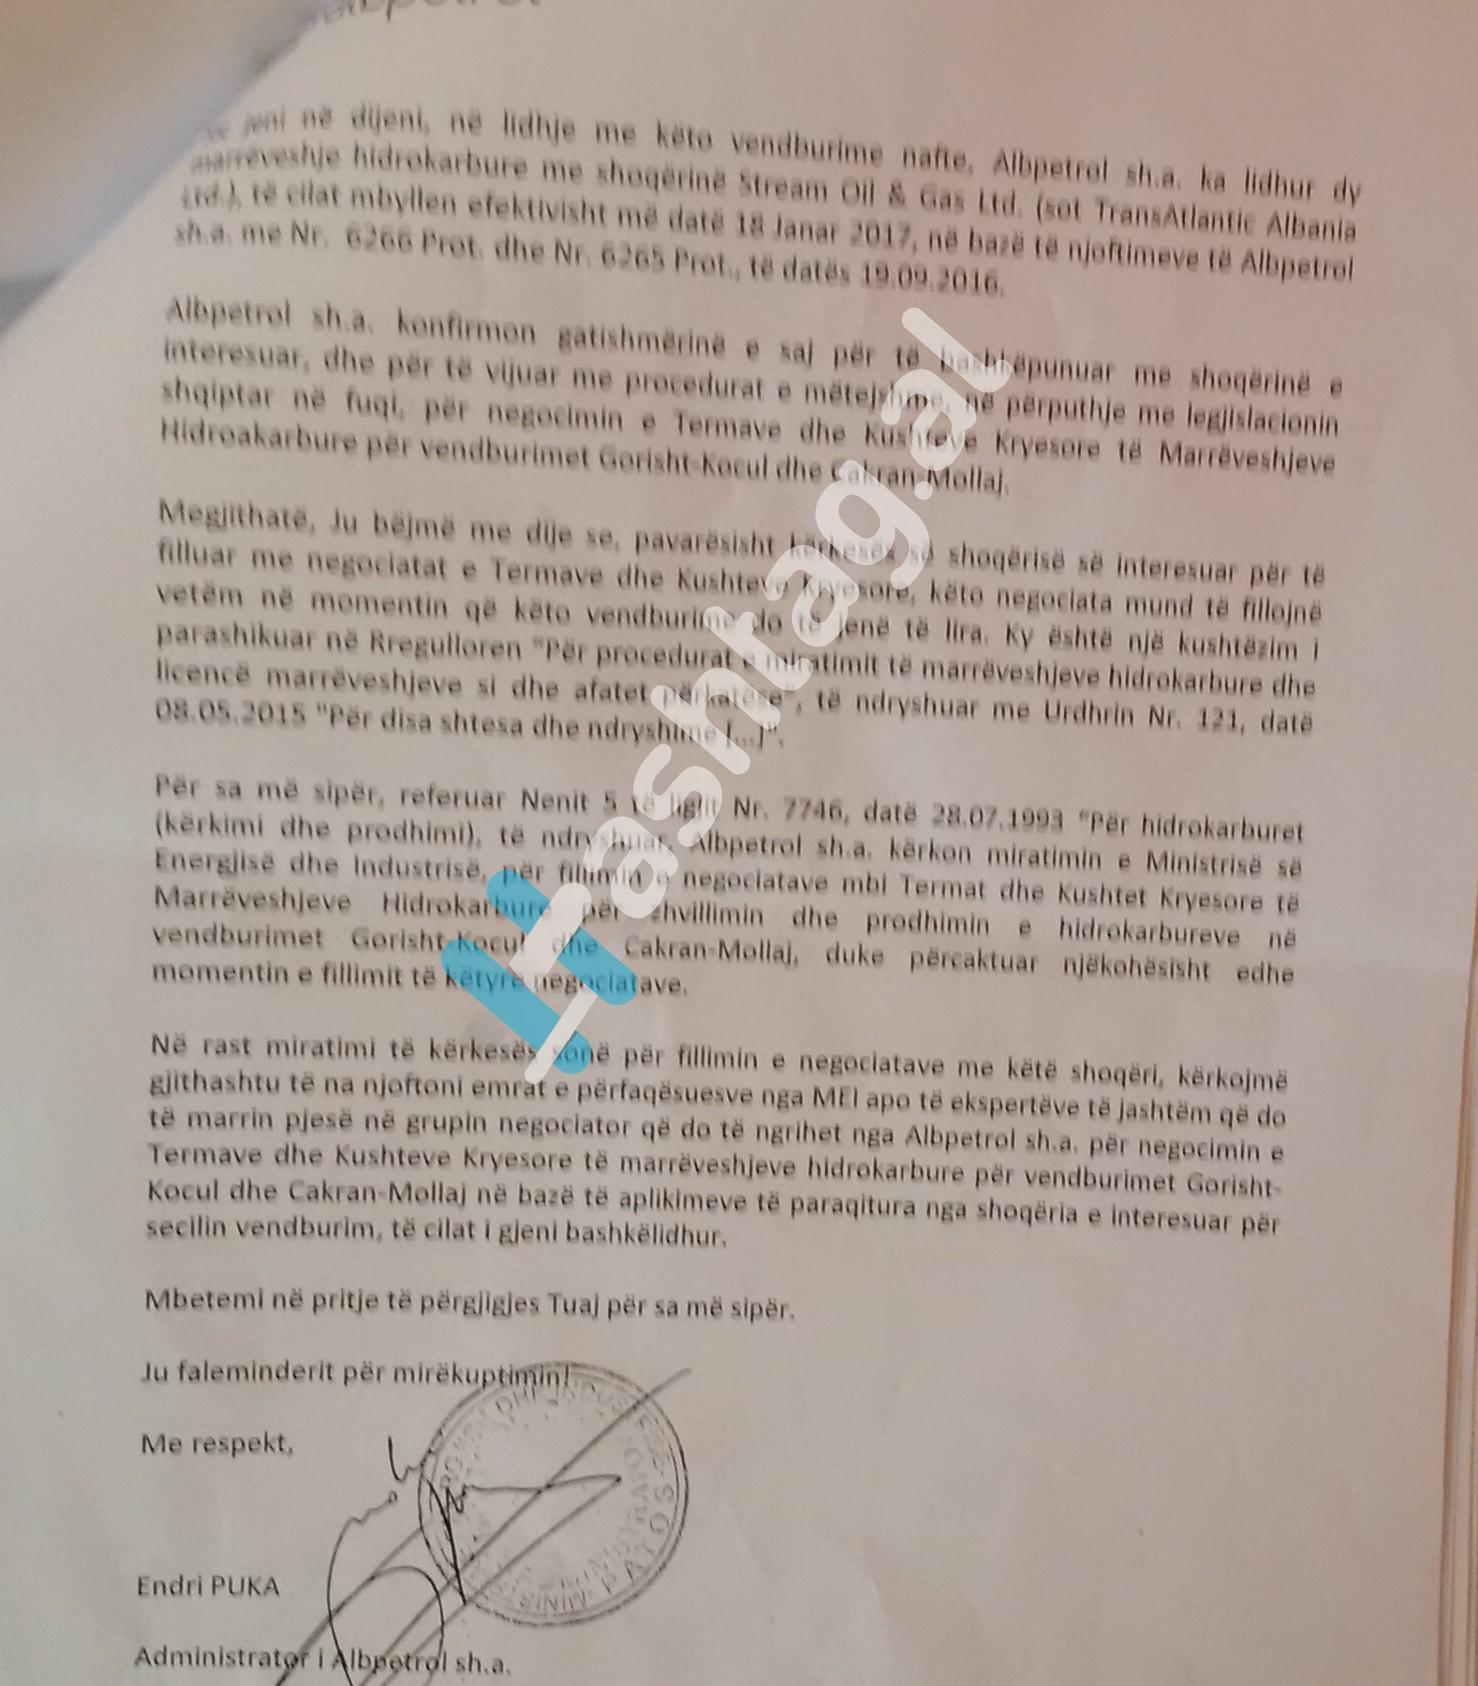 ME LOGO Endri Puka kerkon miratim per te hyre ne negociata zyrtare 2